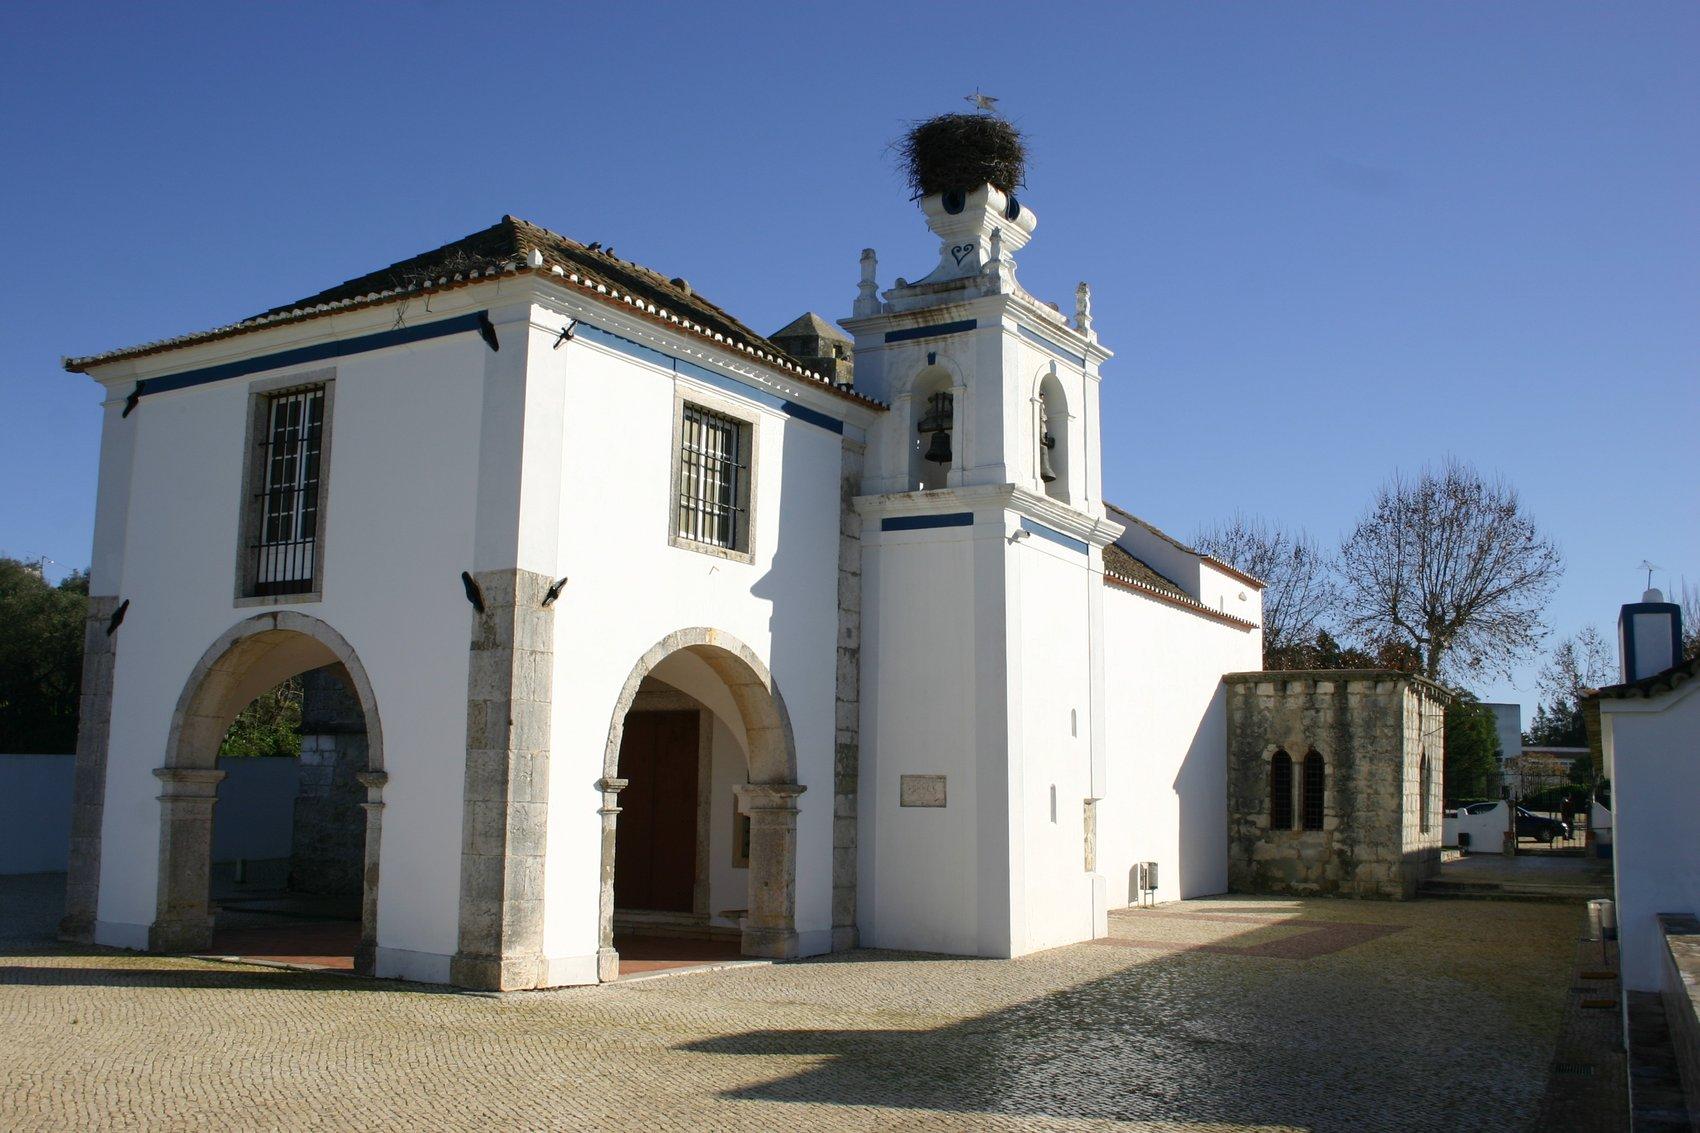 Foto: Município de Alcácer do Sal